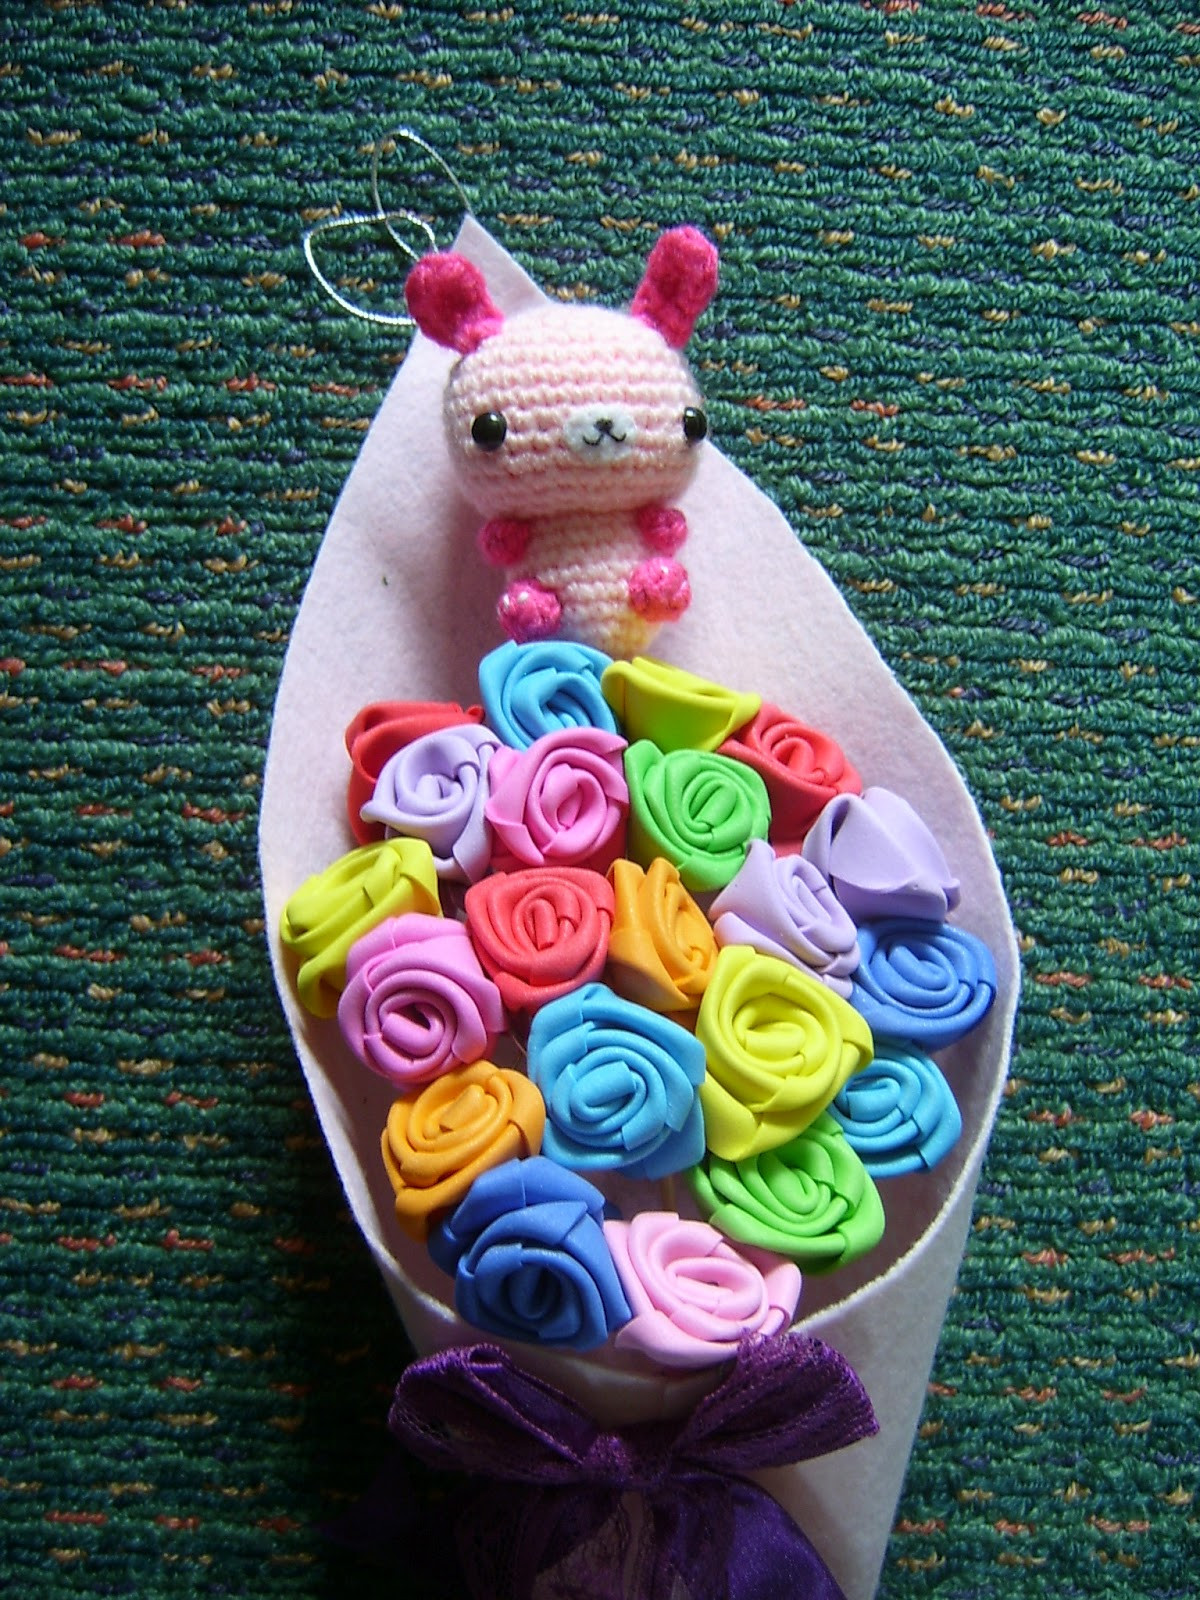 Ideas For A Birthday Gift  Jewellia handicrafts t idea for 21st birthday present